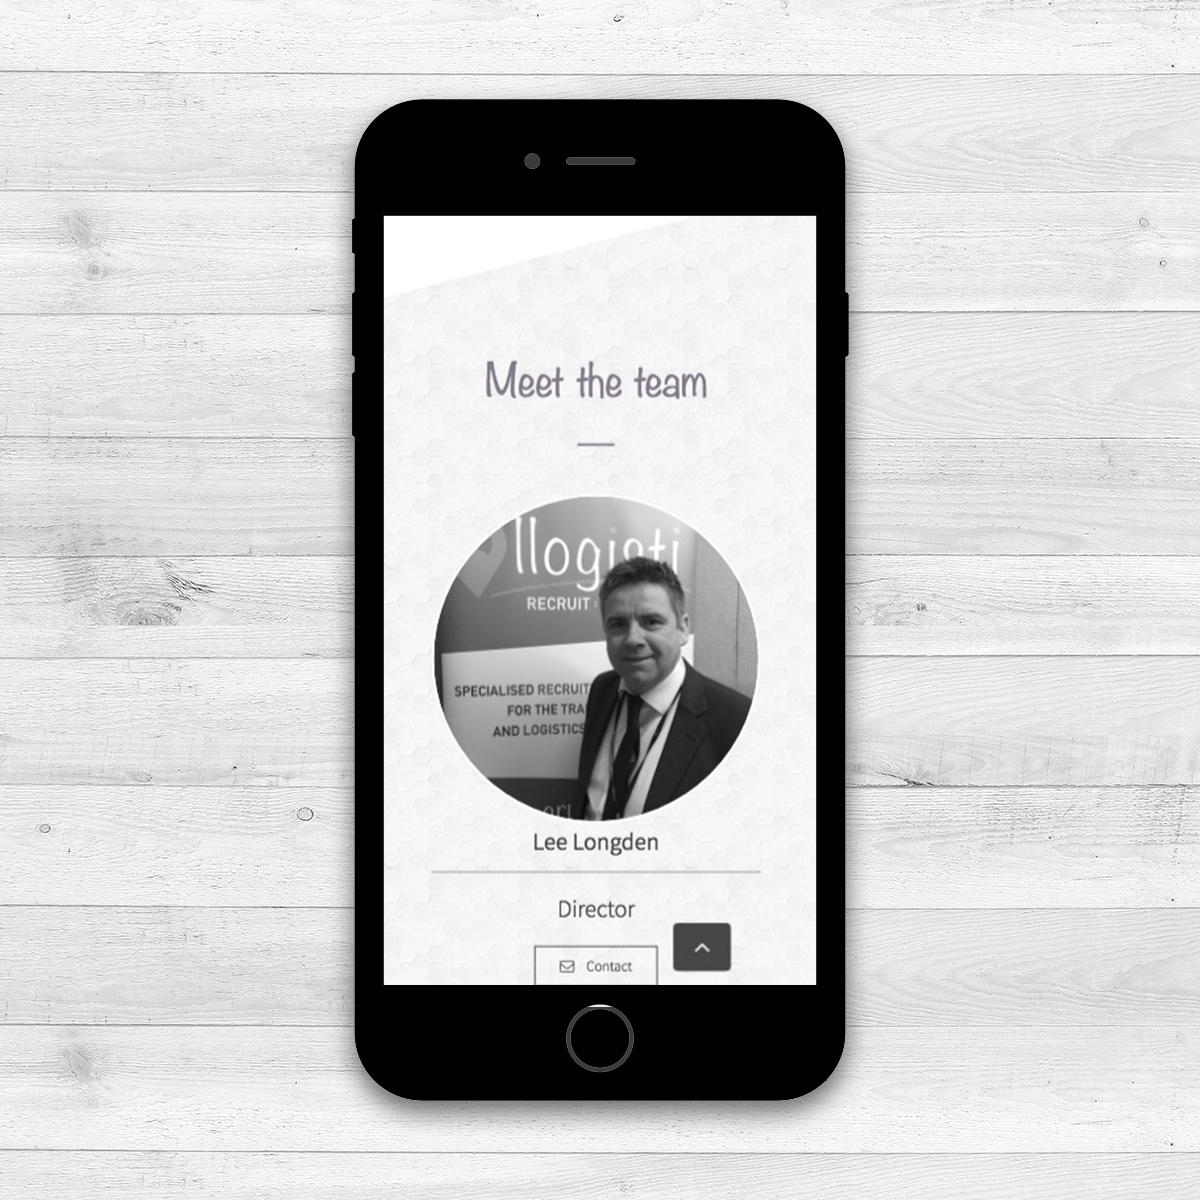 Business Branding - Llogisti Recruit:Consult | The Digital Moose